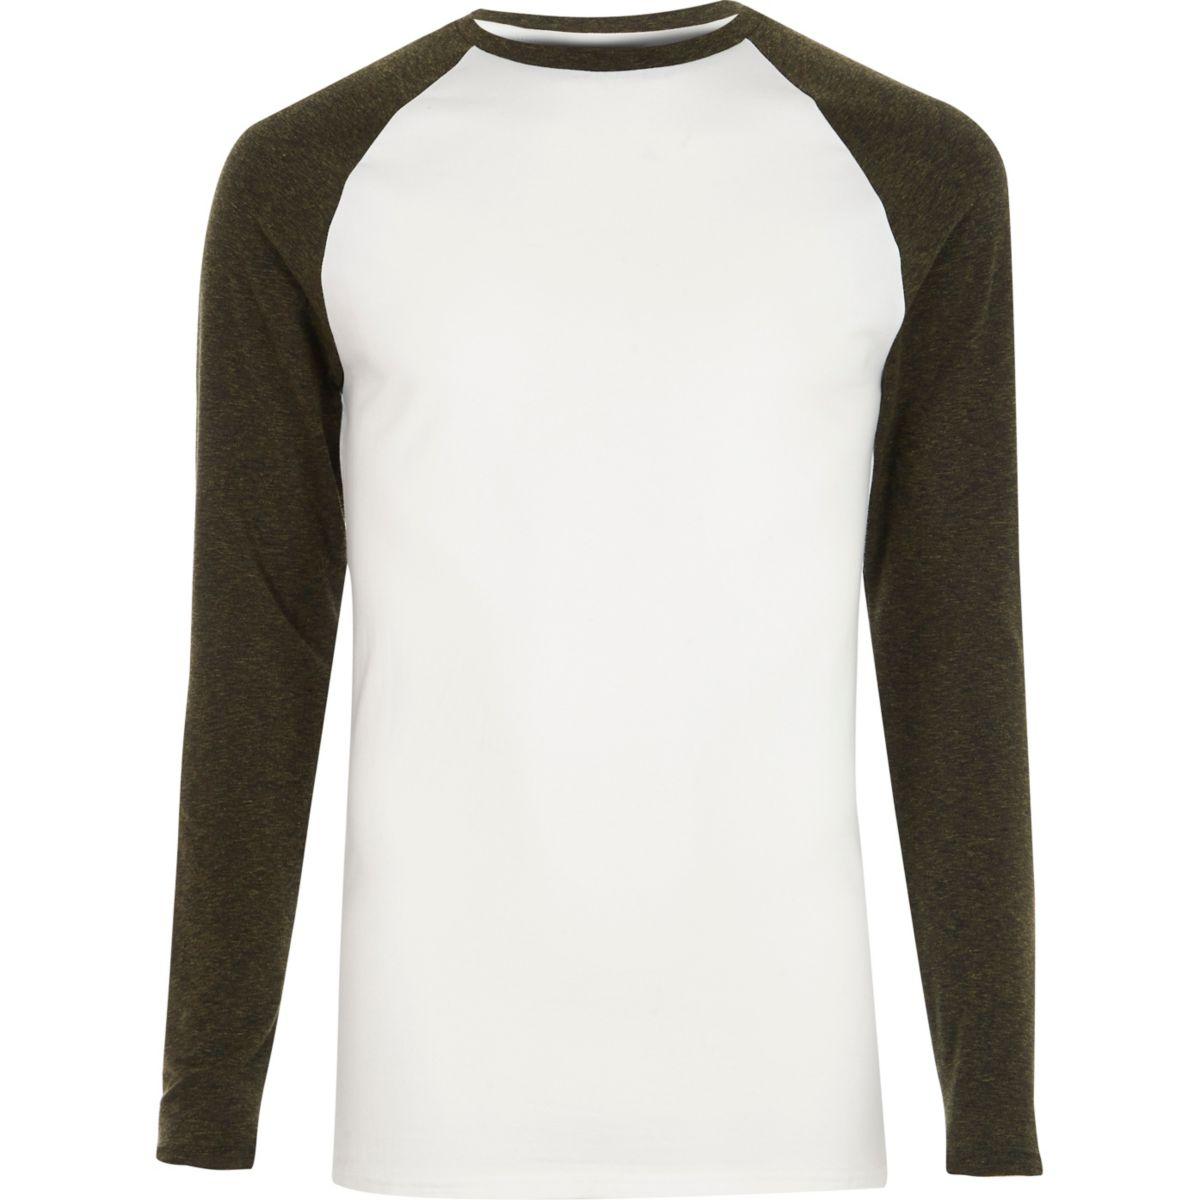 White and khaki long sleeve raglan T-shirt